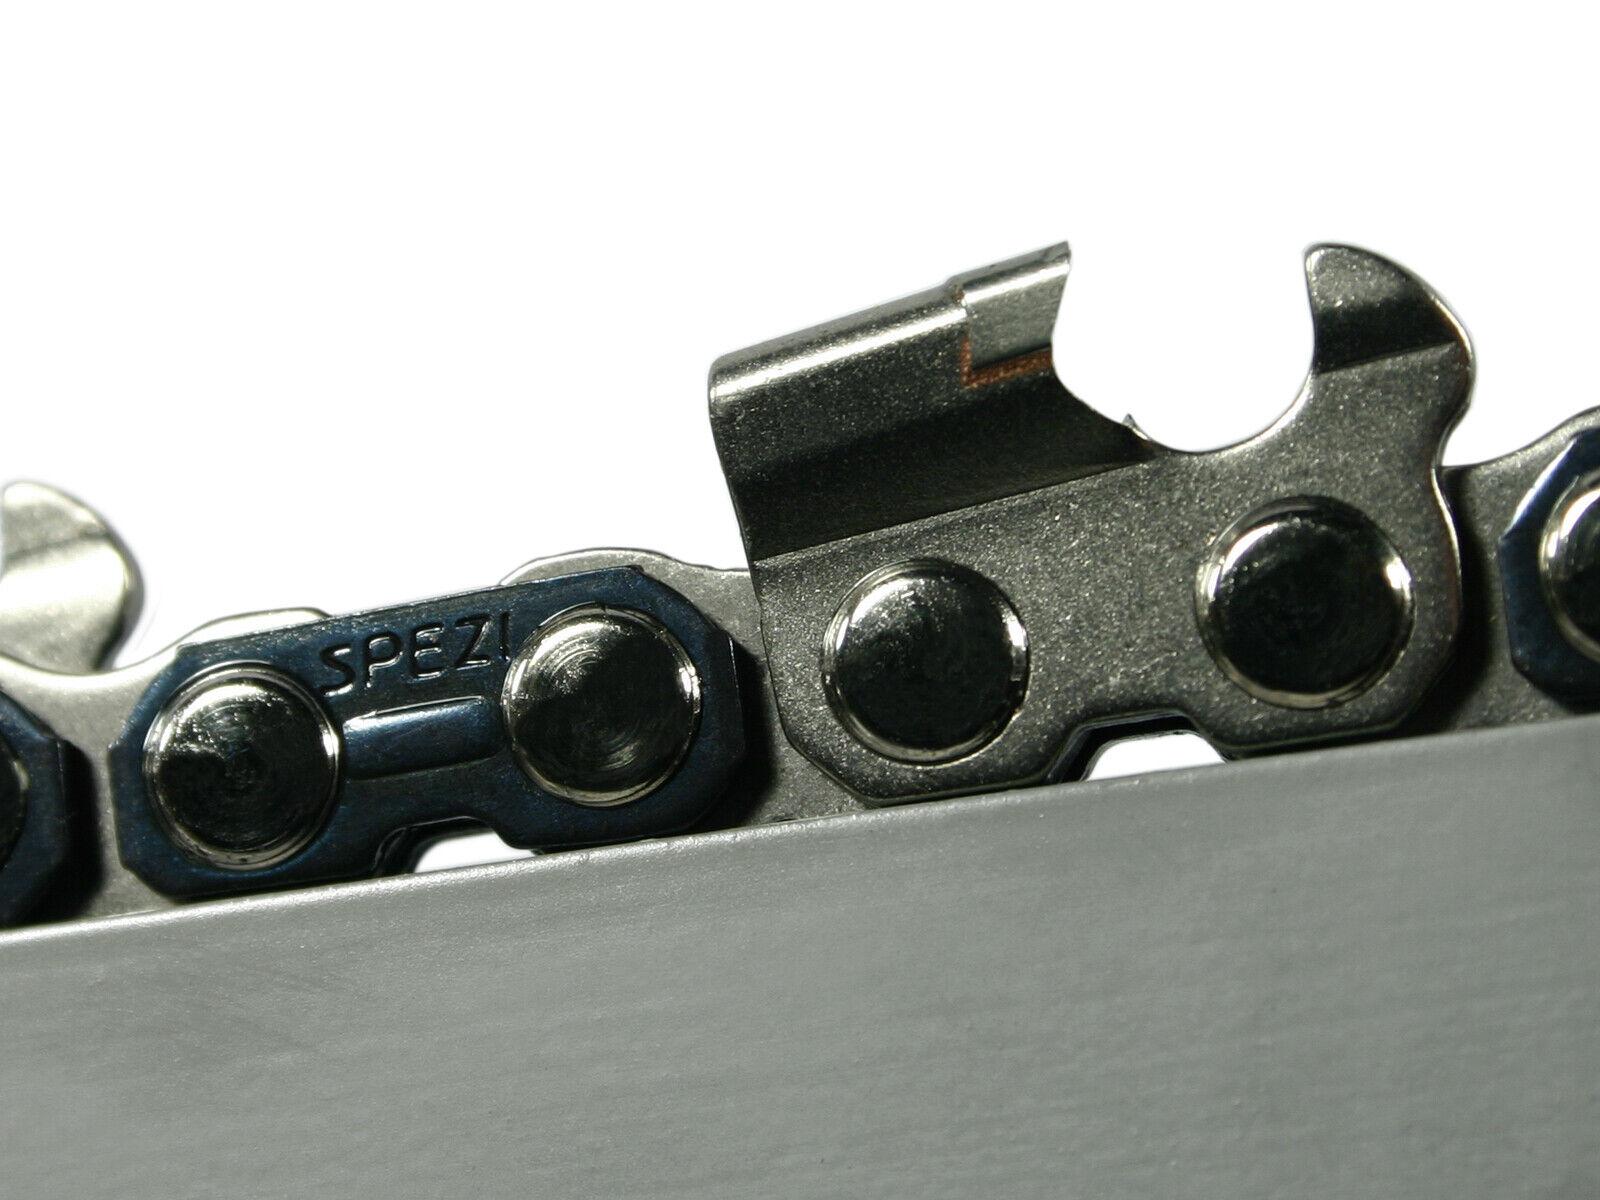 Metal duro cadena sierra adecuado para Husqvarna 576 XP 43 cm 3 8  64 TG 1,5 mm Chain